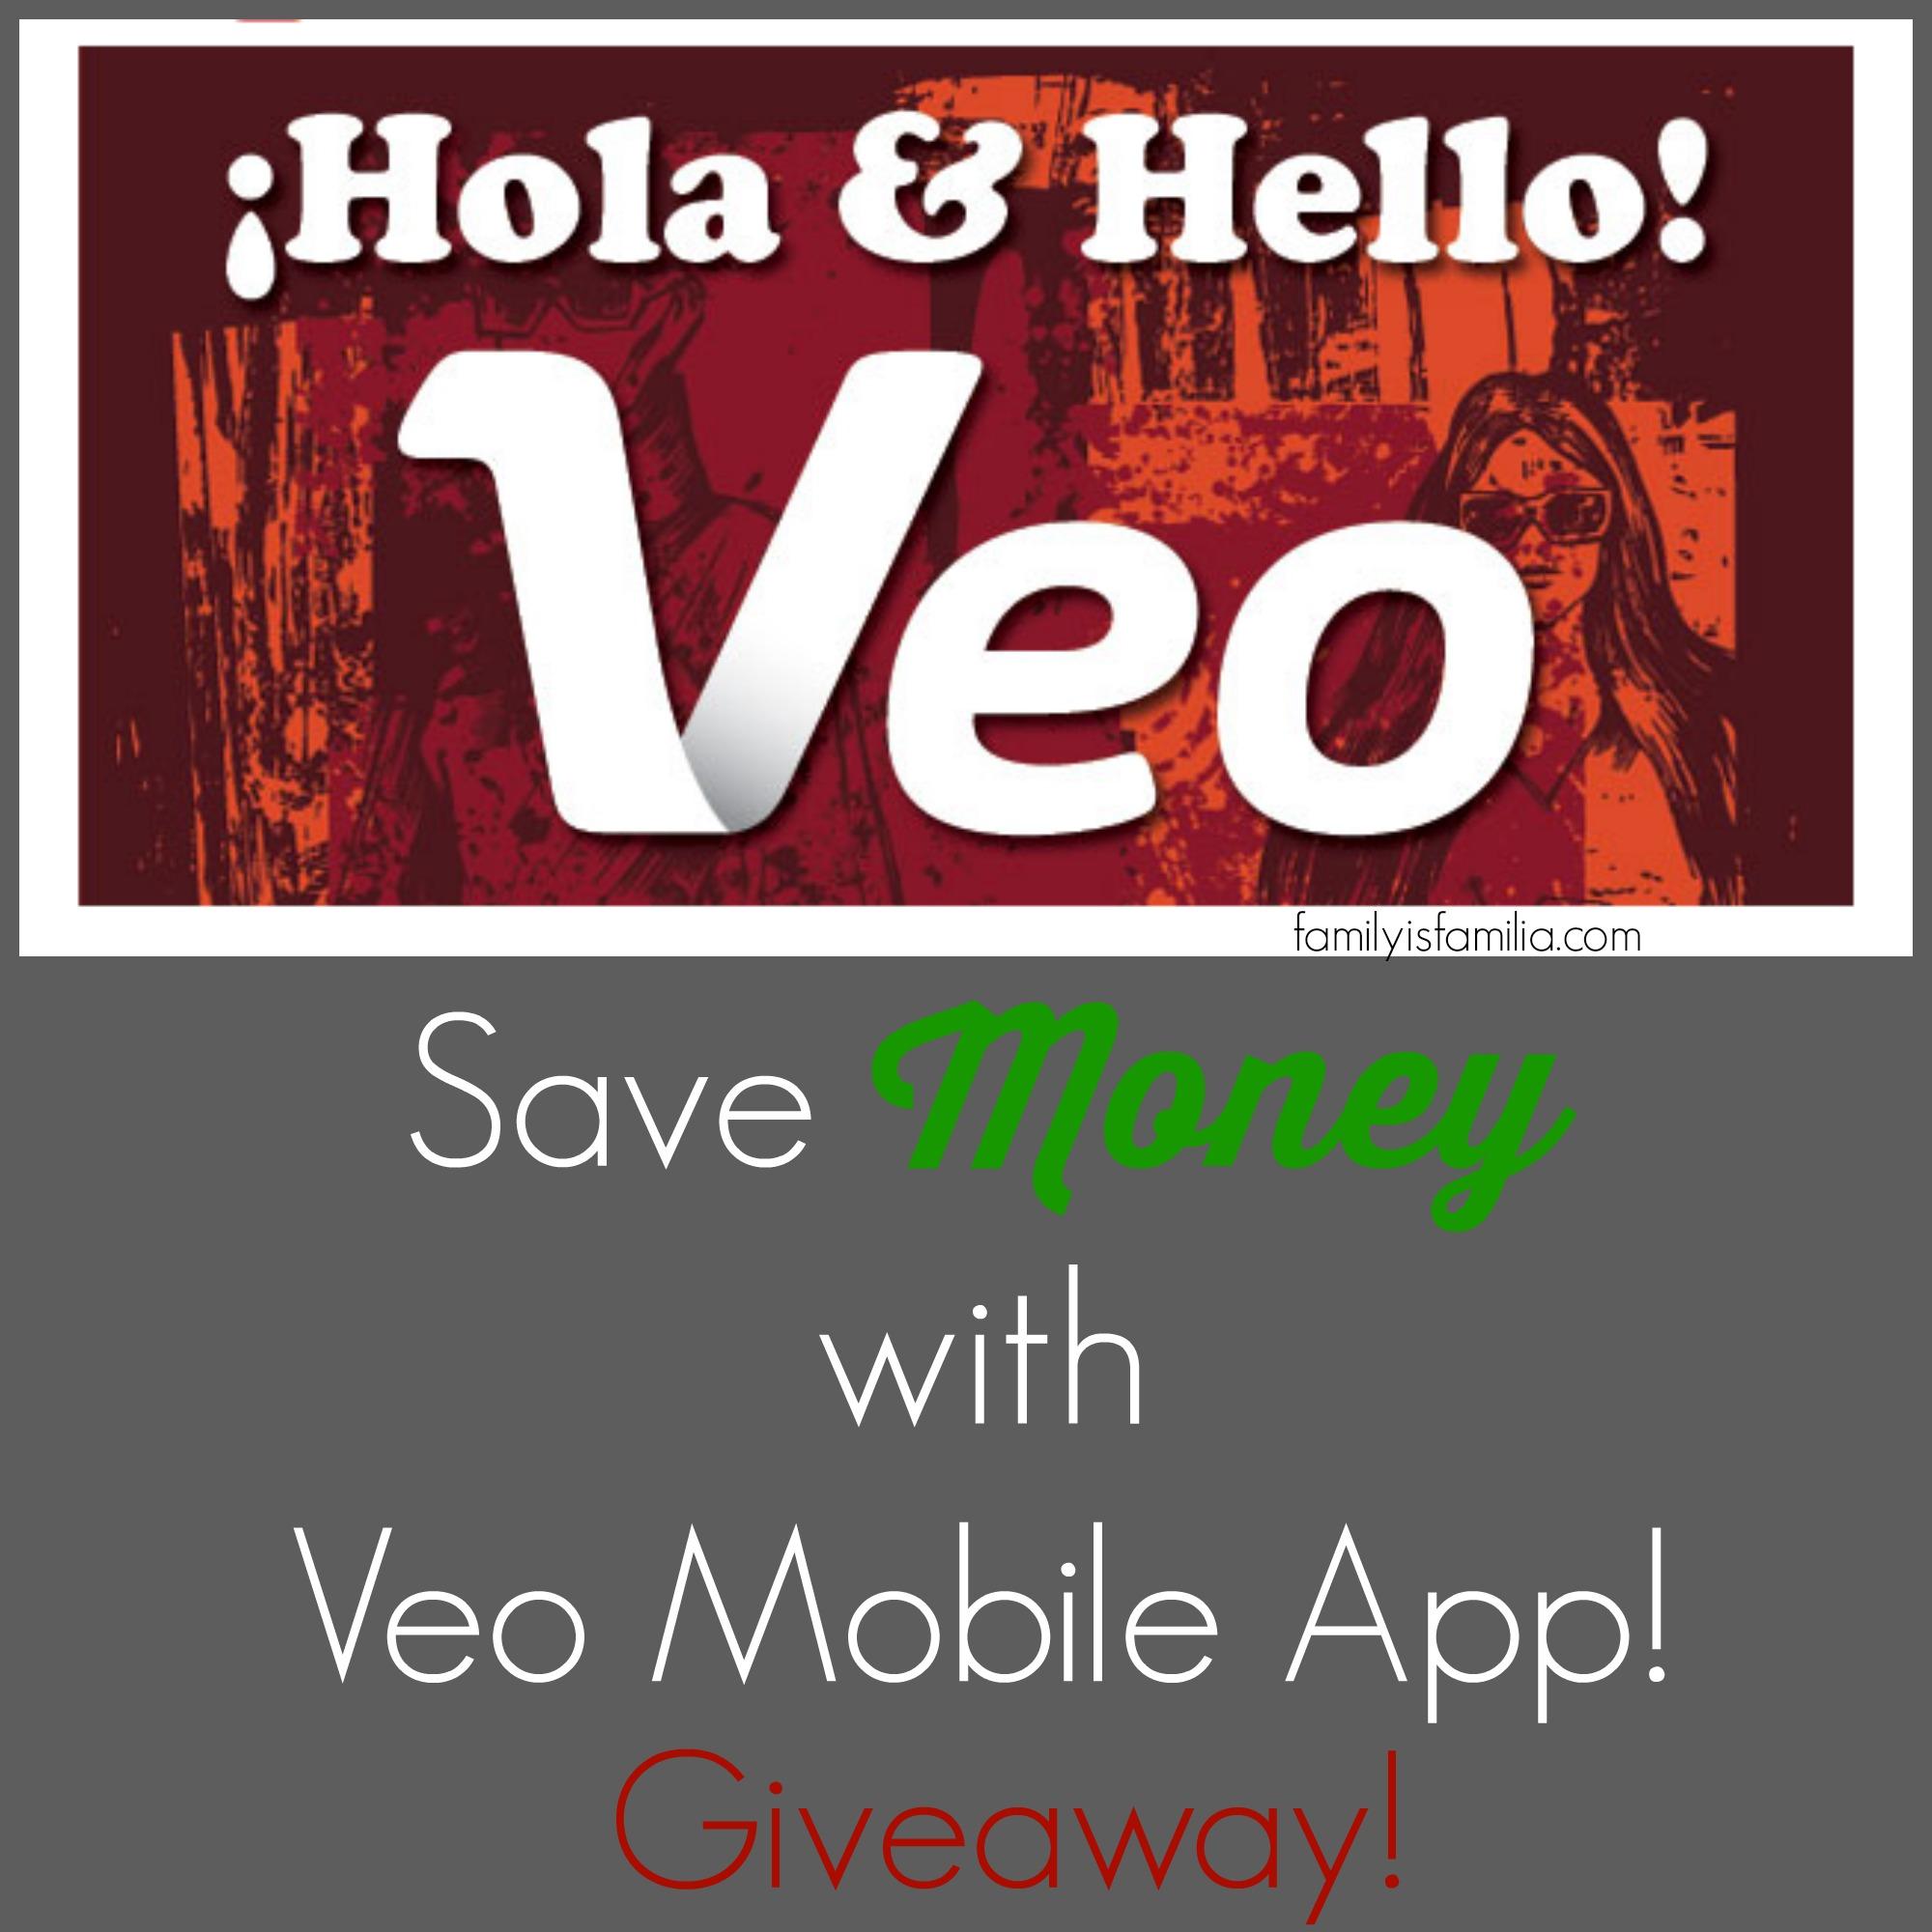 saving-money-veo-mobile-app